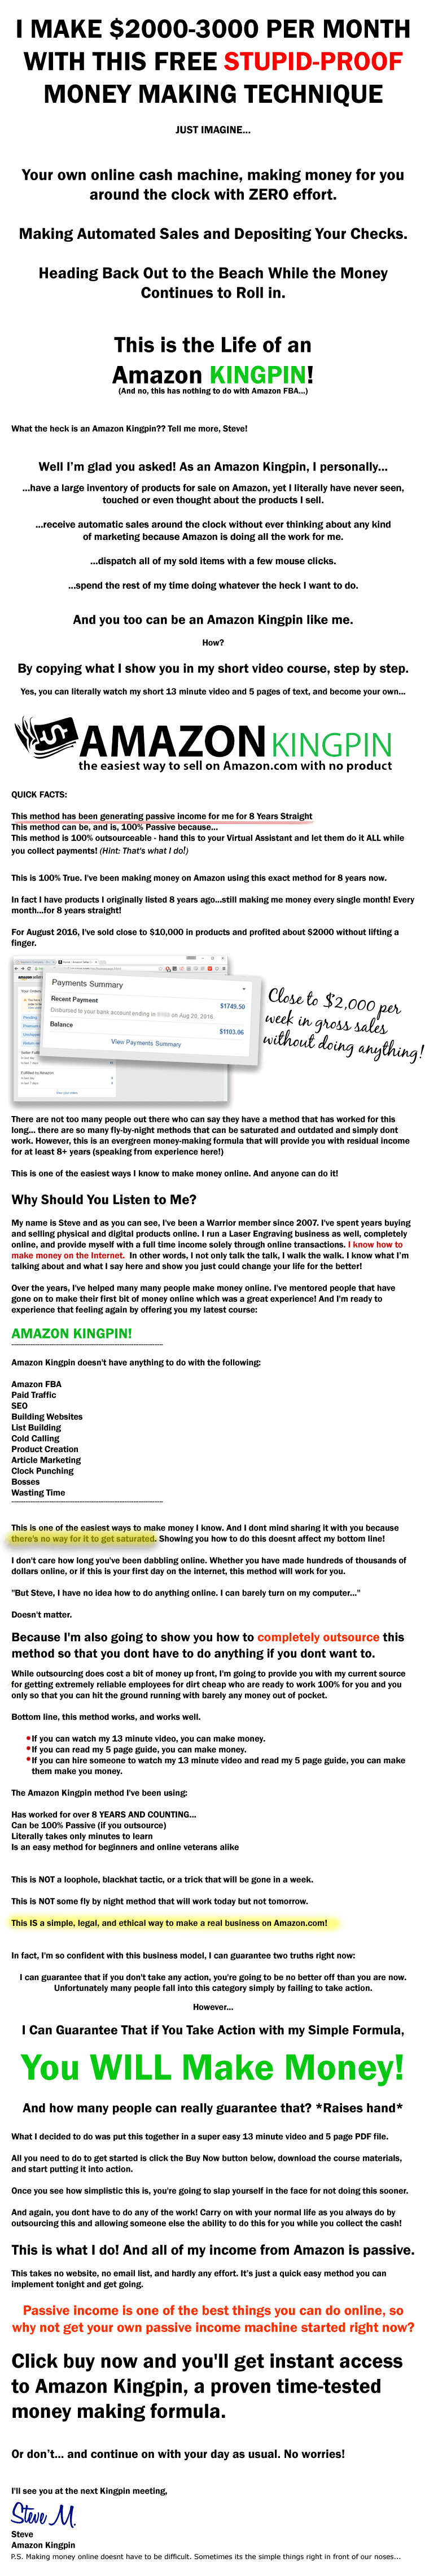 亚马逊上100%外包销售产品每月收入00-00 (Amazon Kingpin)